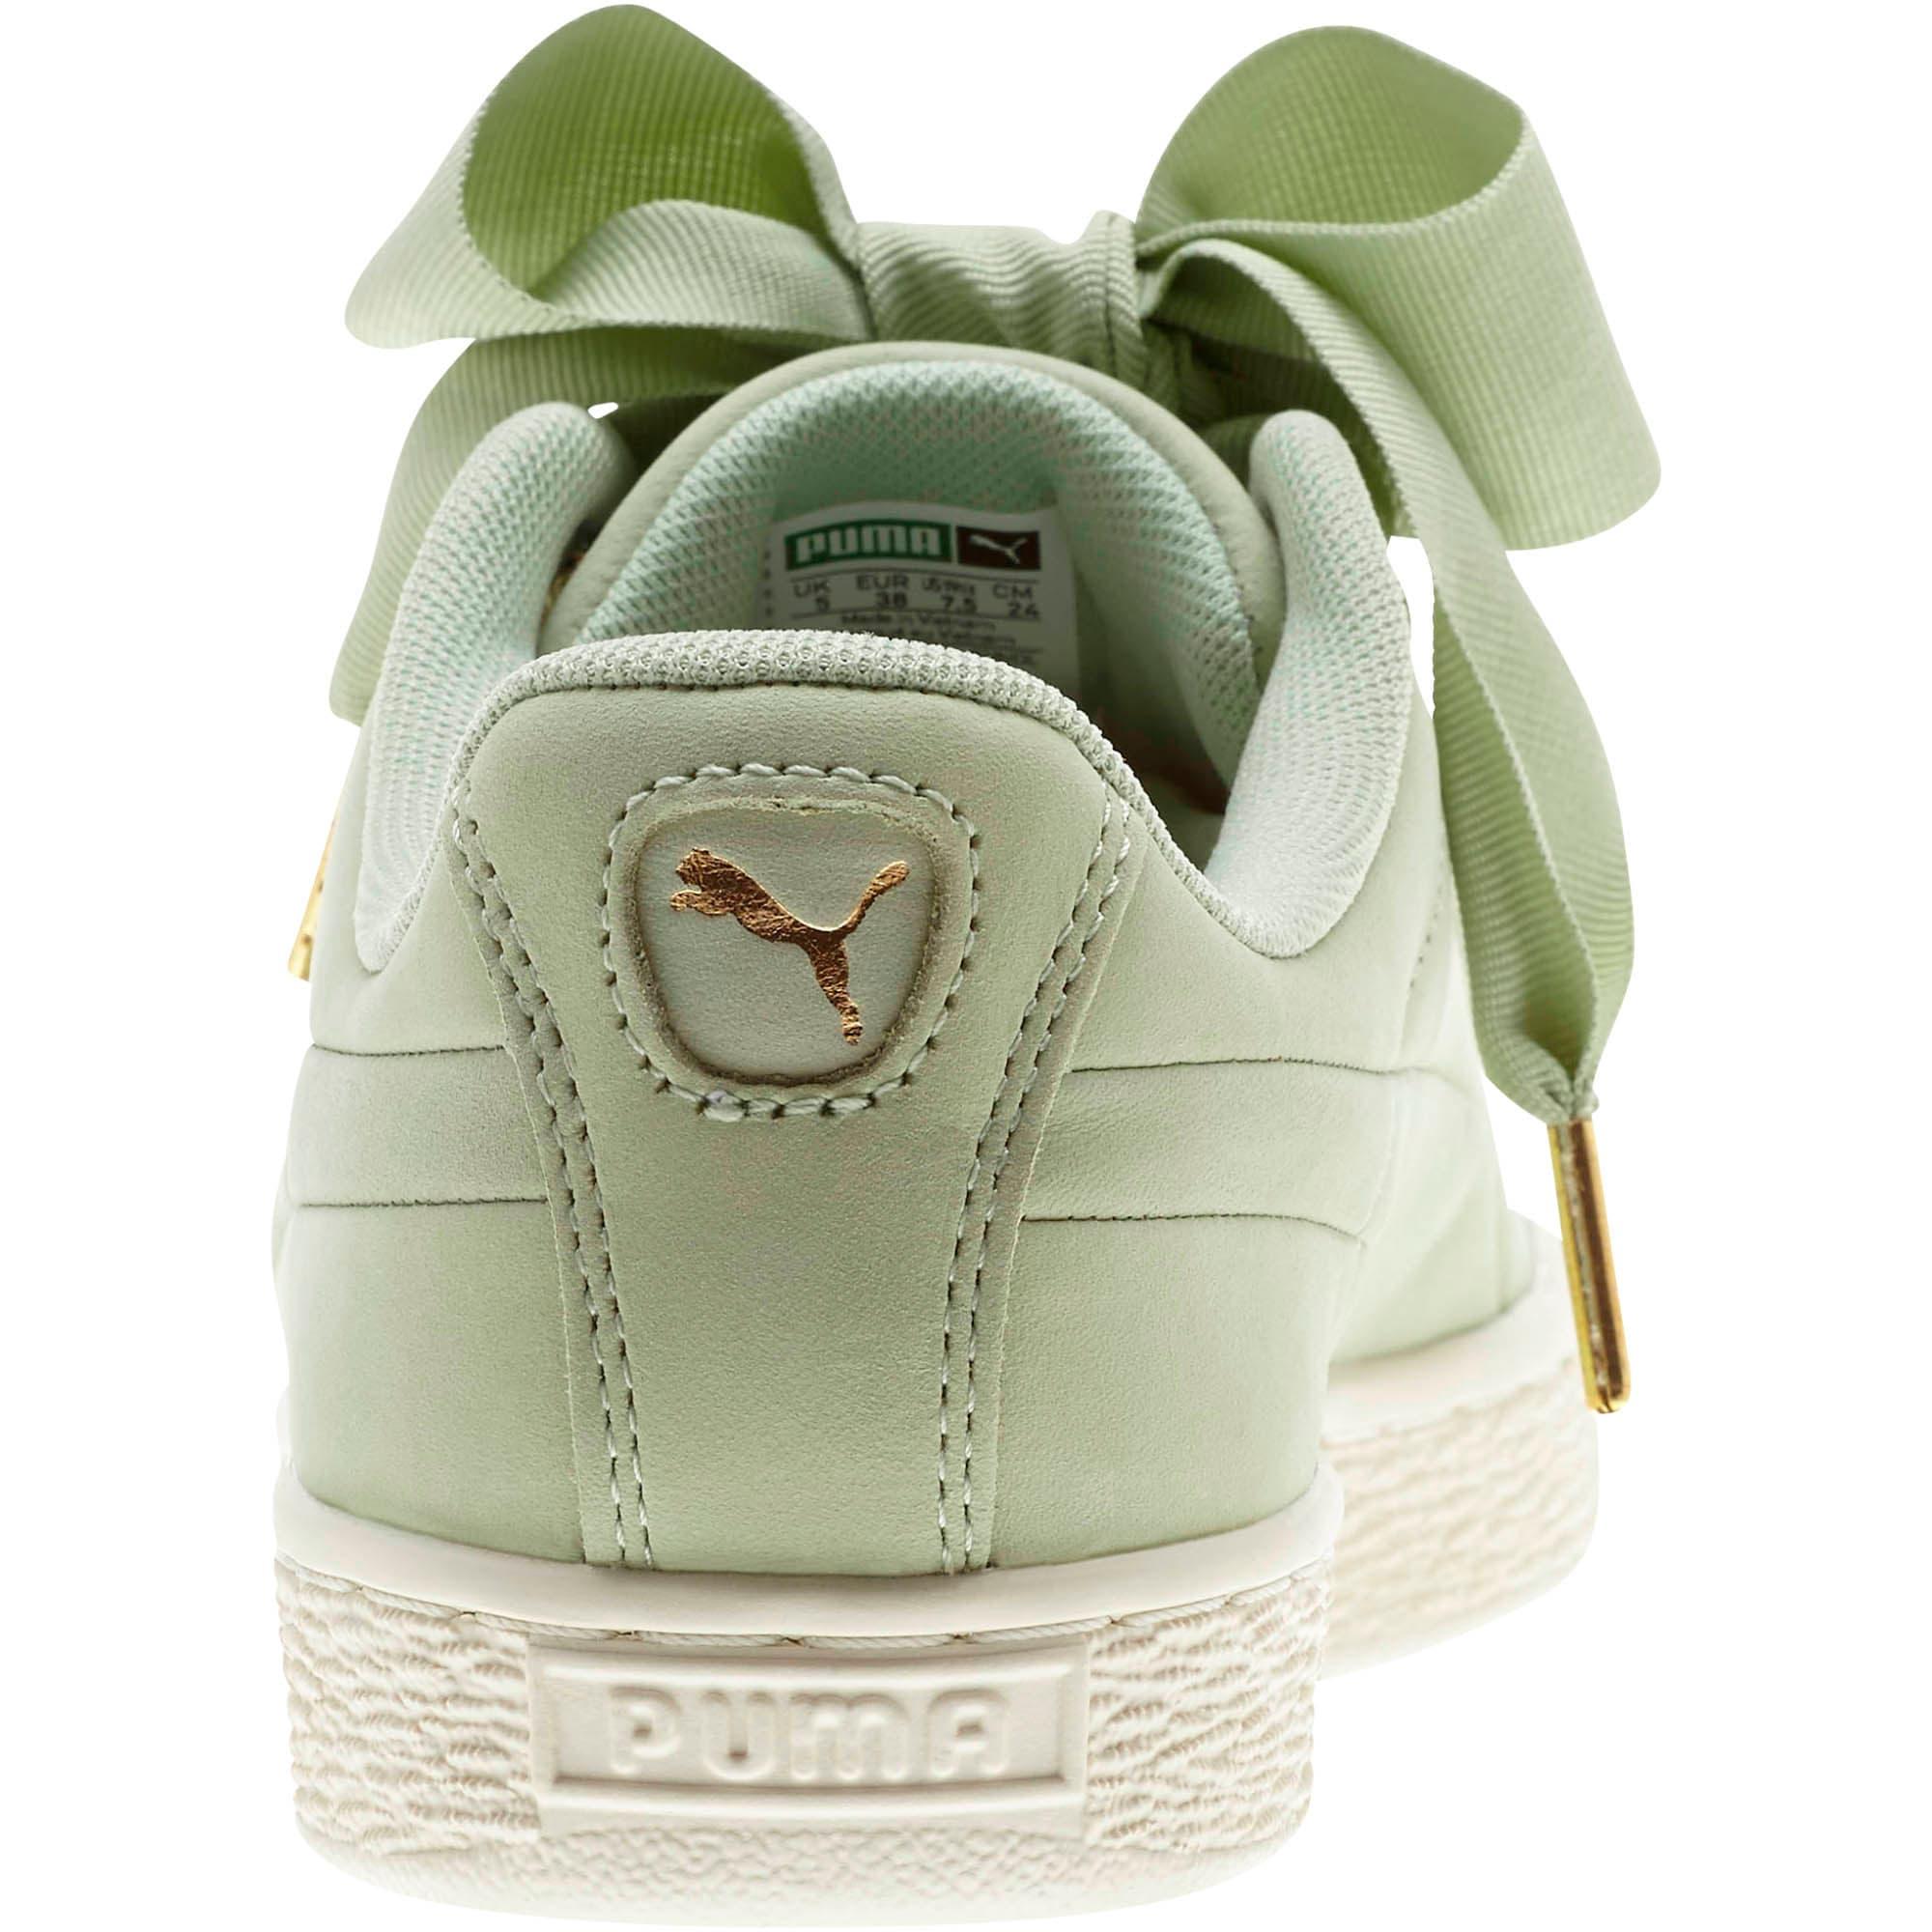 Thumbnail 3 of Basket Heart Soft Women's Sneakers, Smoke Green-Marshmallow, medium